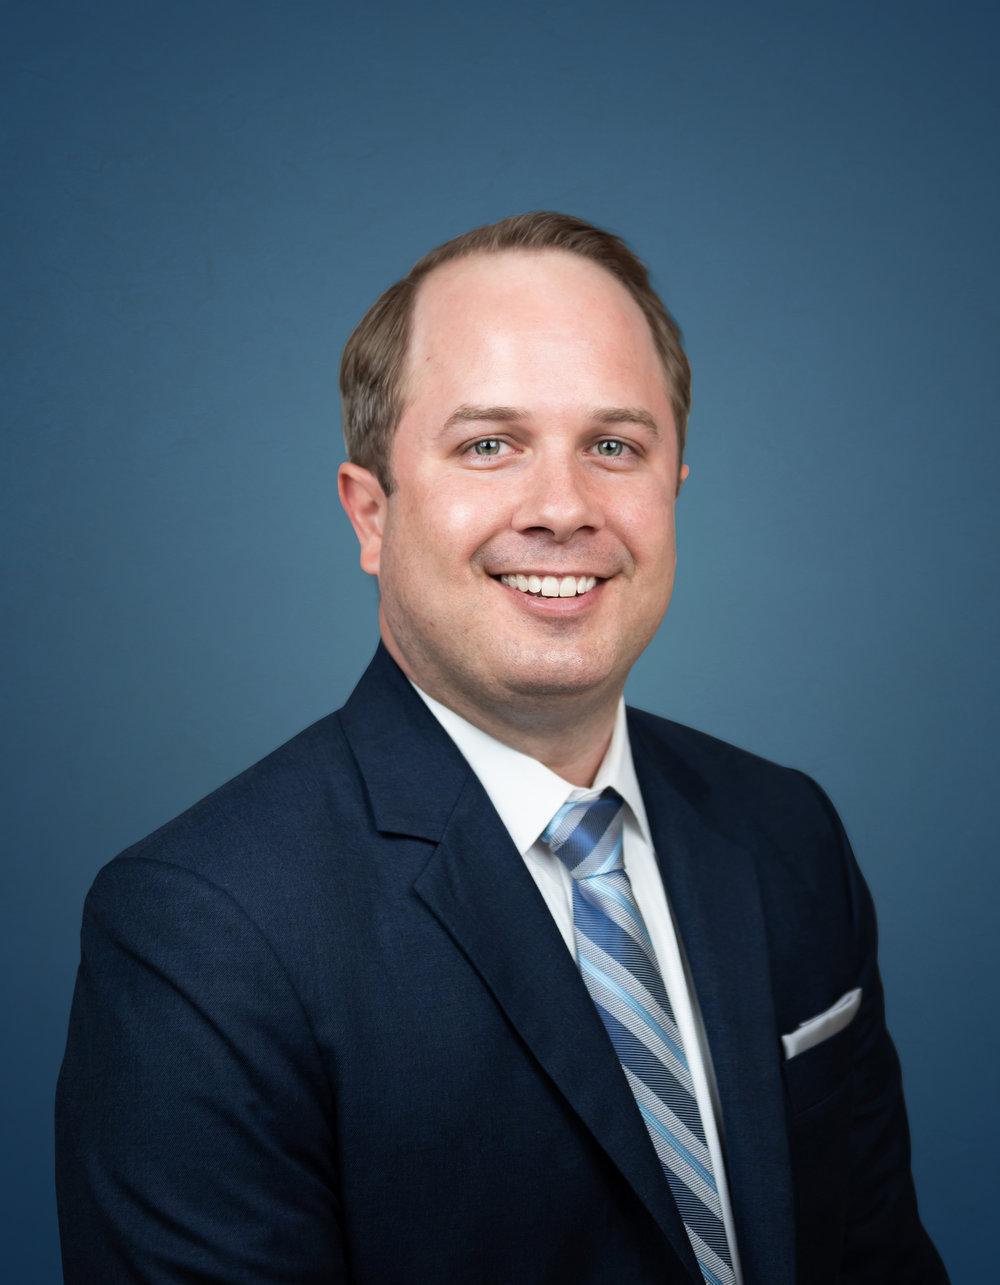 Jonathan Kirkland VP of Sales and Logistics Berg Pipe Group